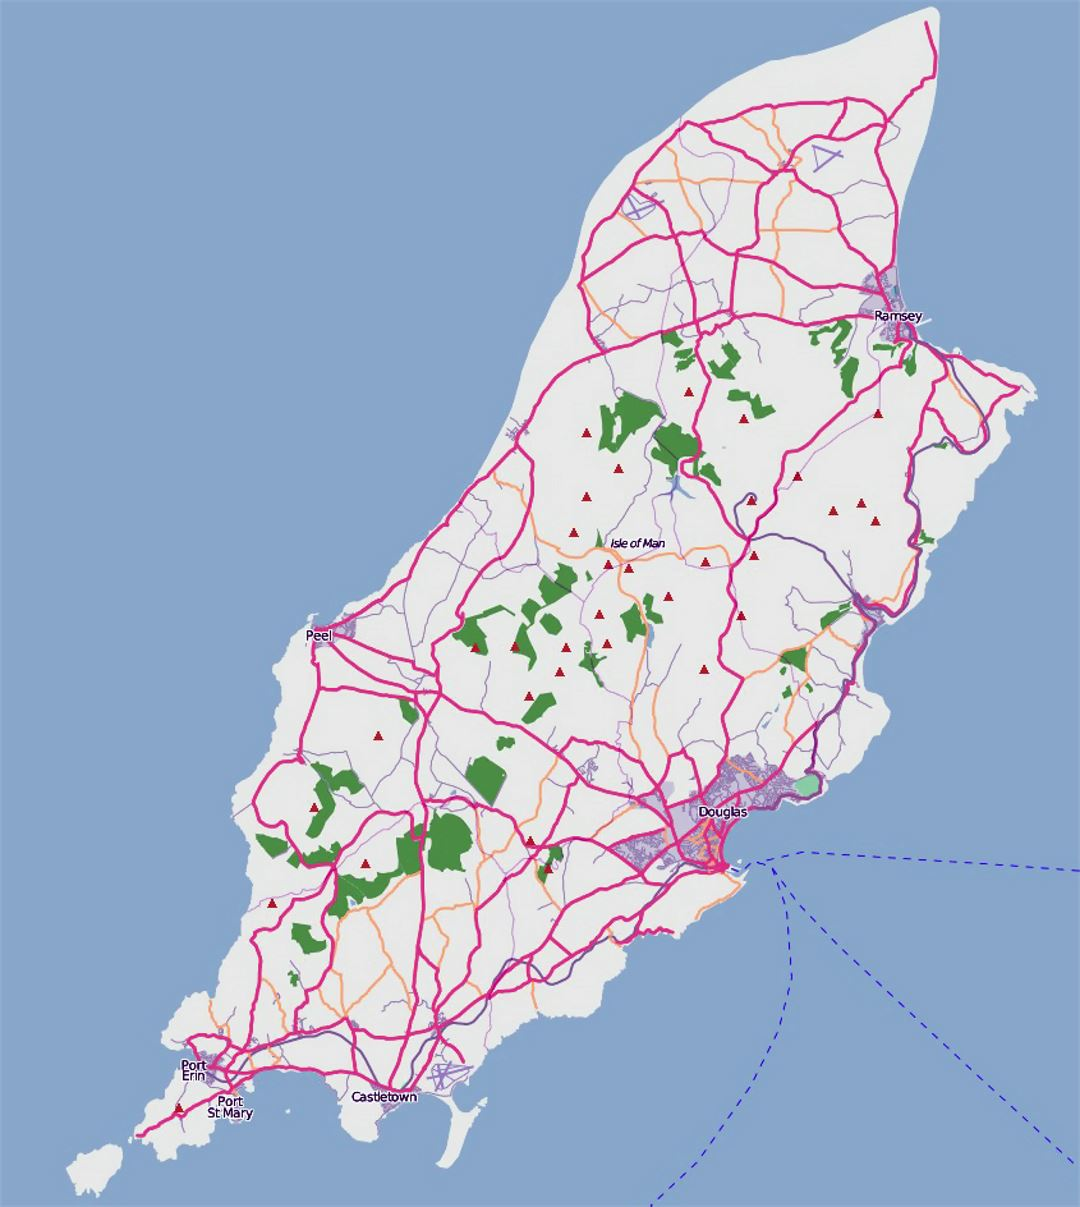 Detailed road map of Isle of Man Isle of Man Europe Mapsland